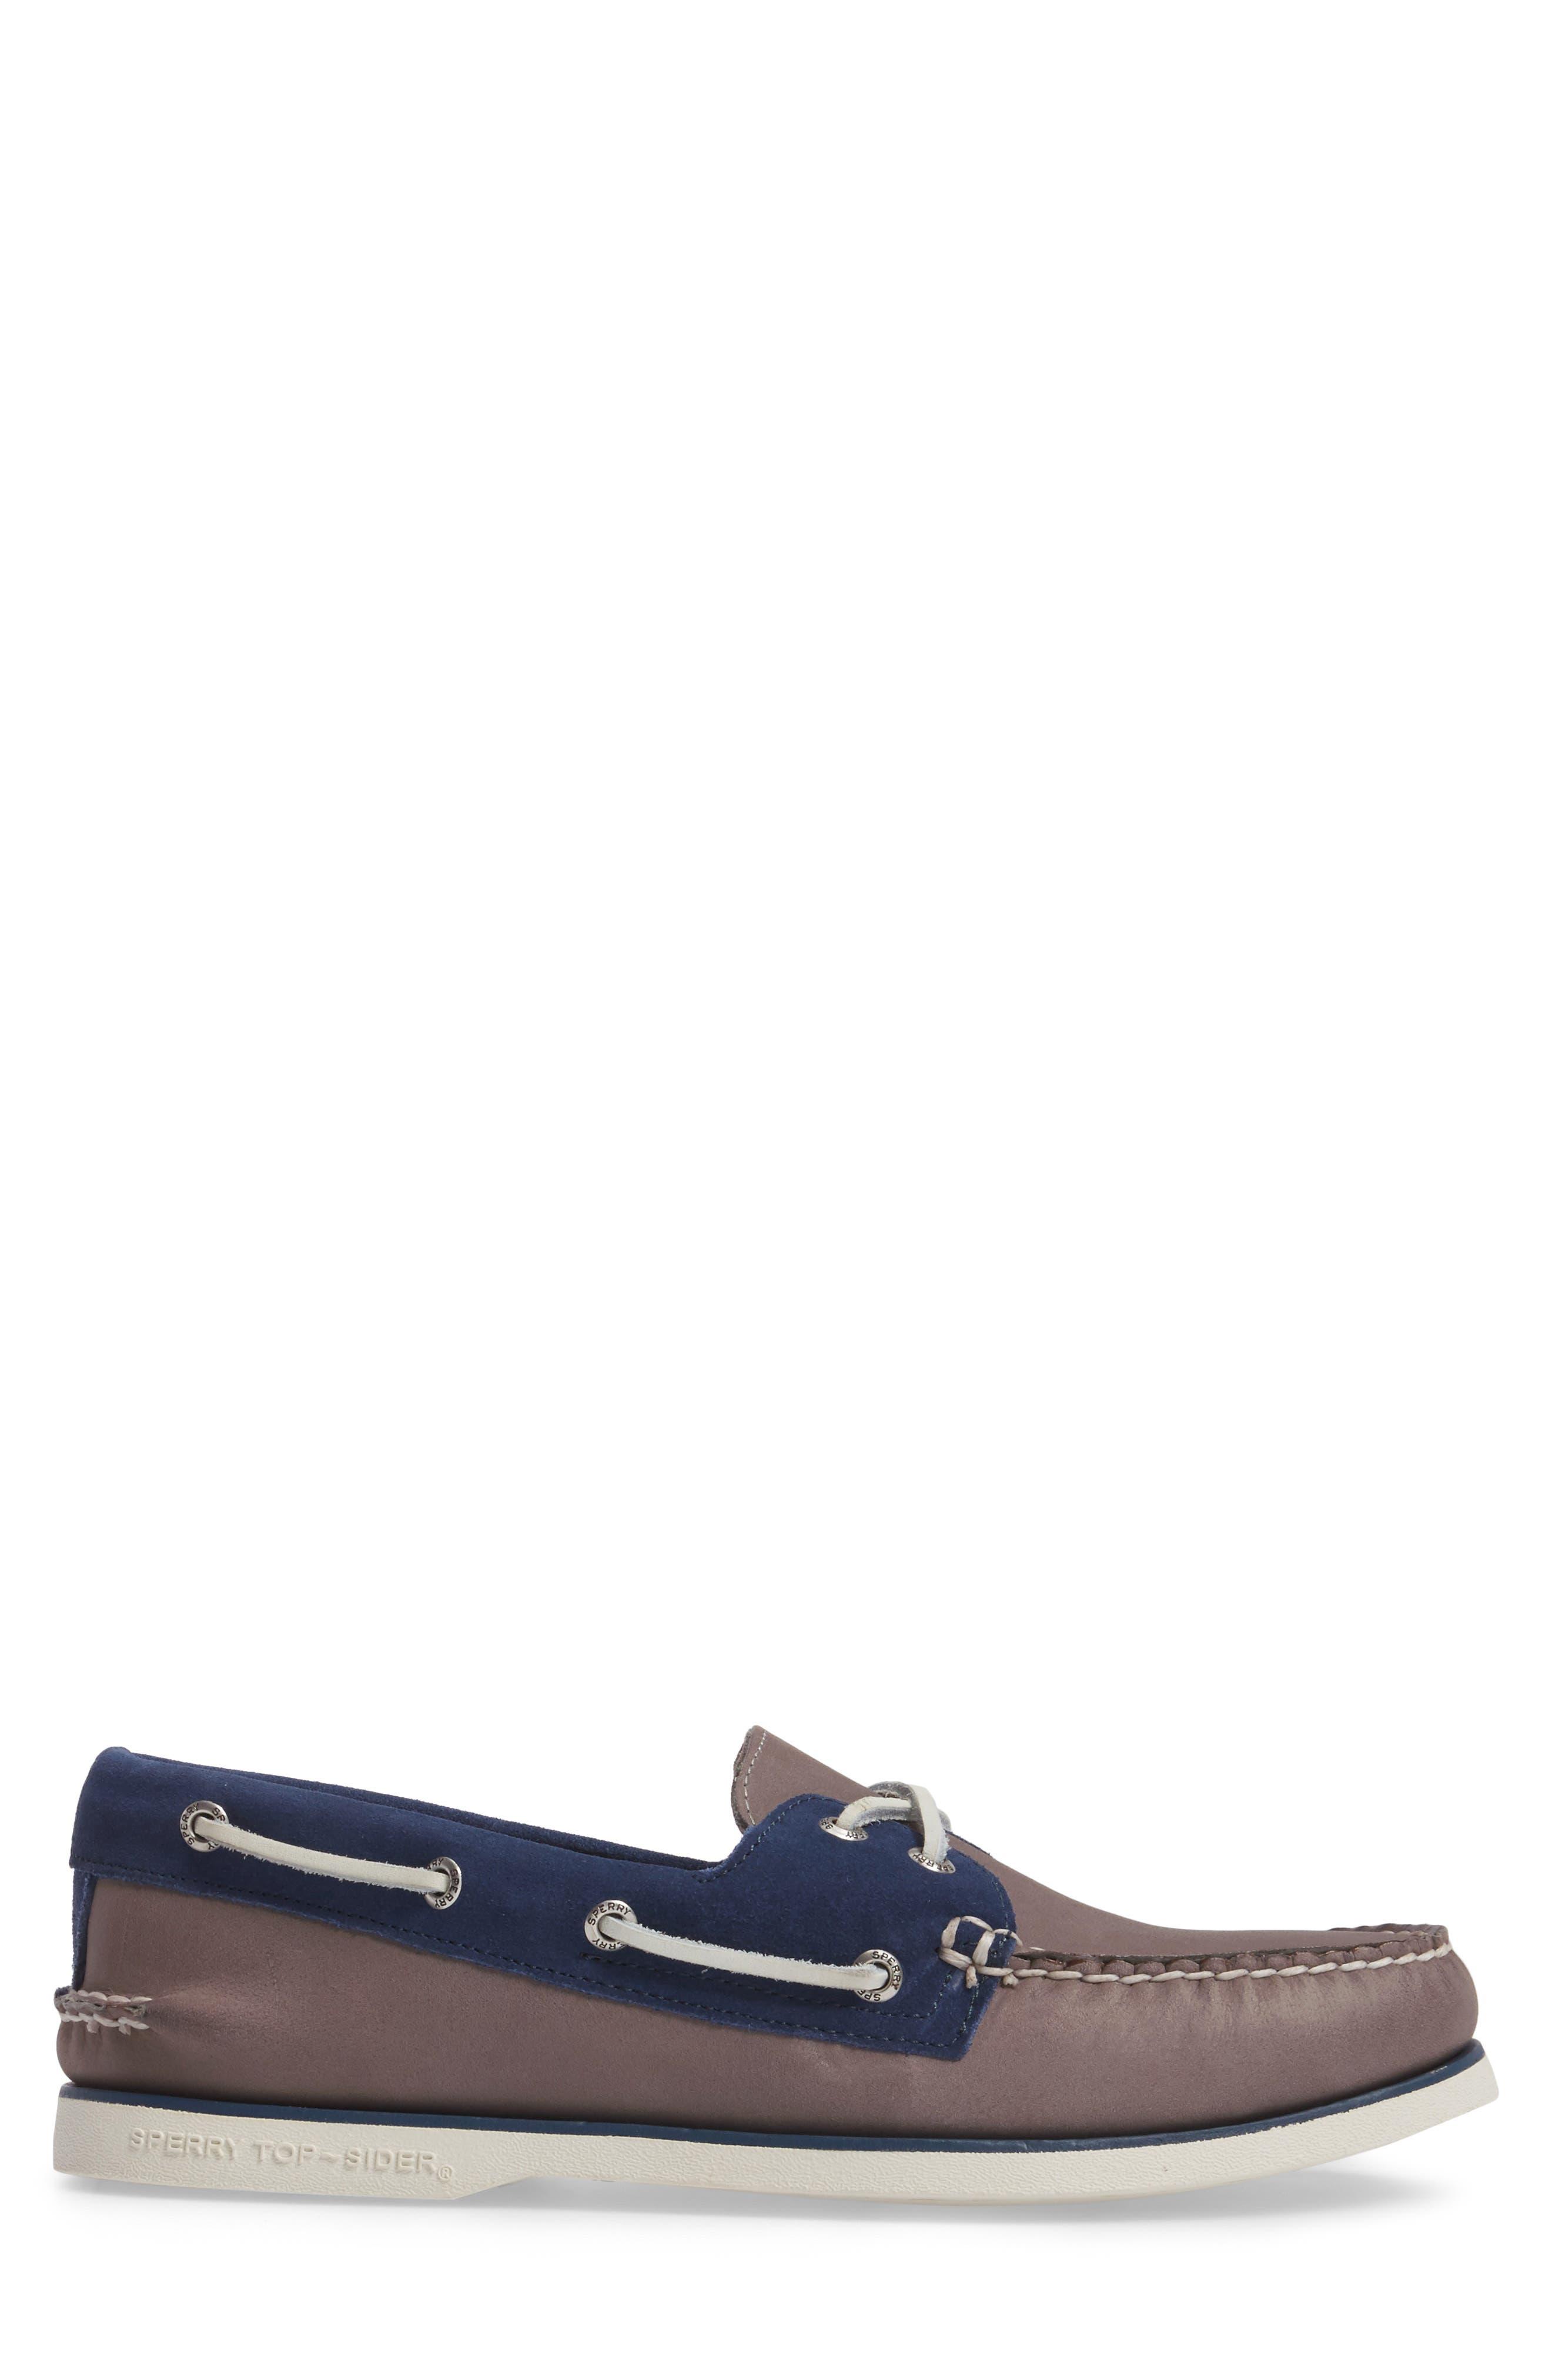 Alternate Image 3  - Sperry Gold Cup Authentic Original Boat Shoe (Men)